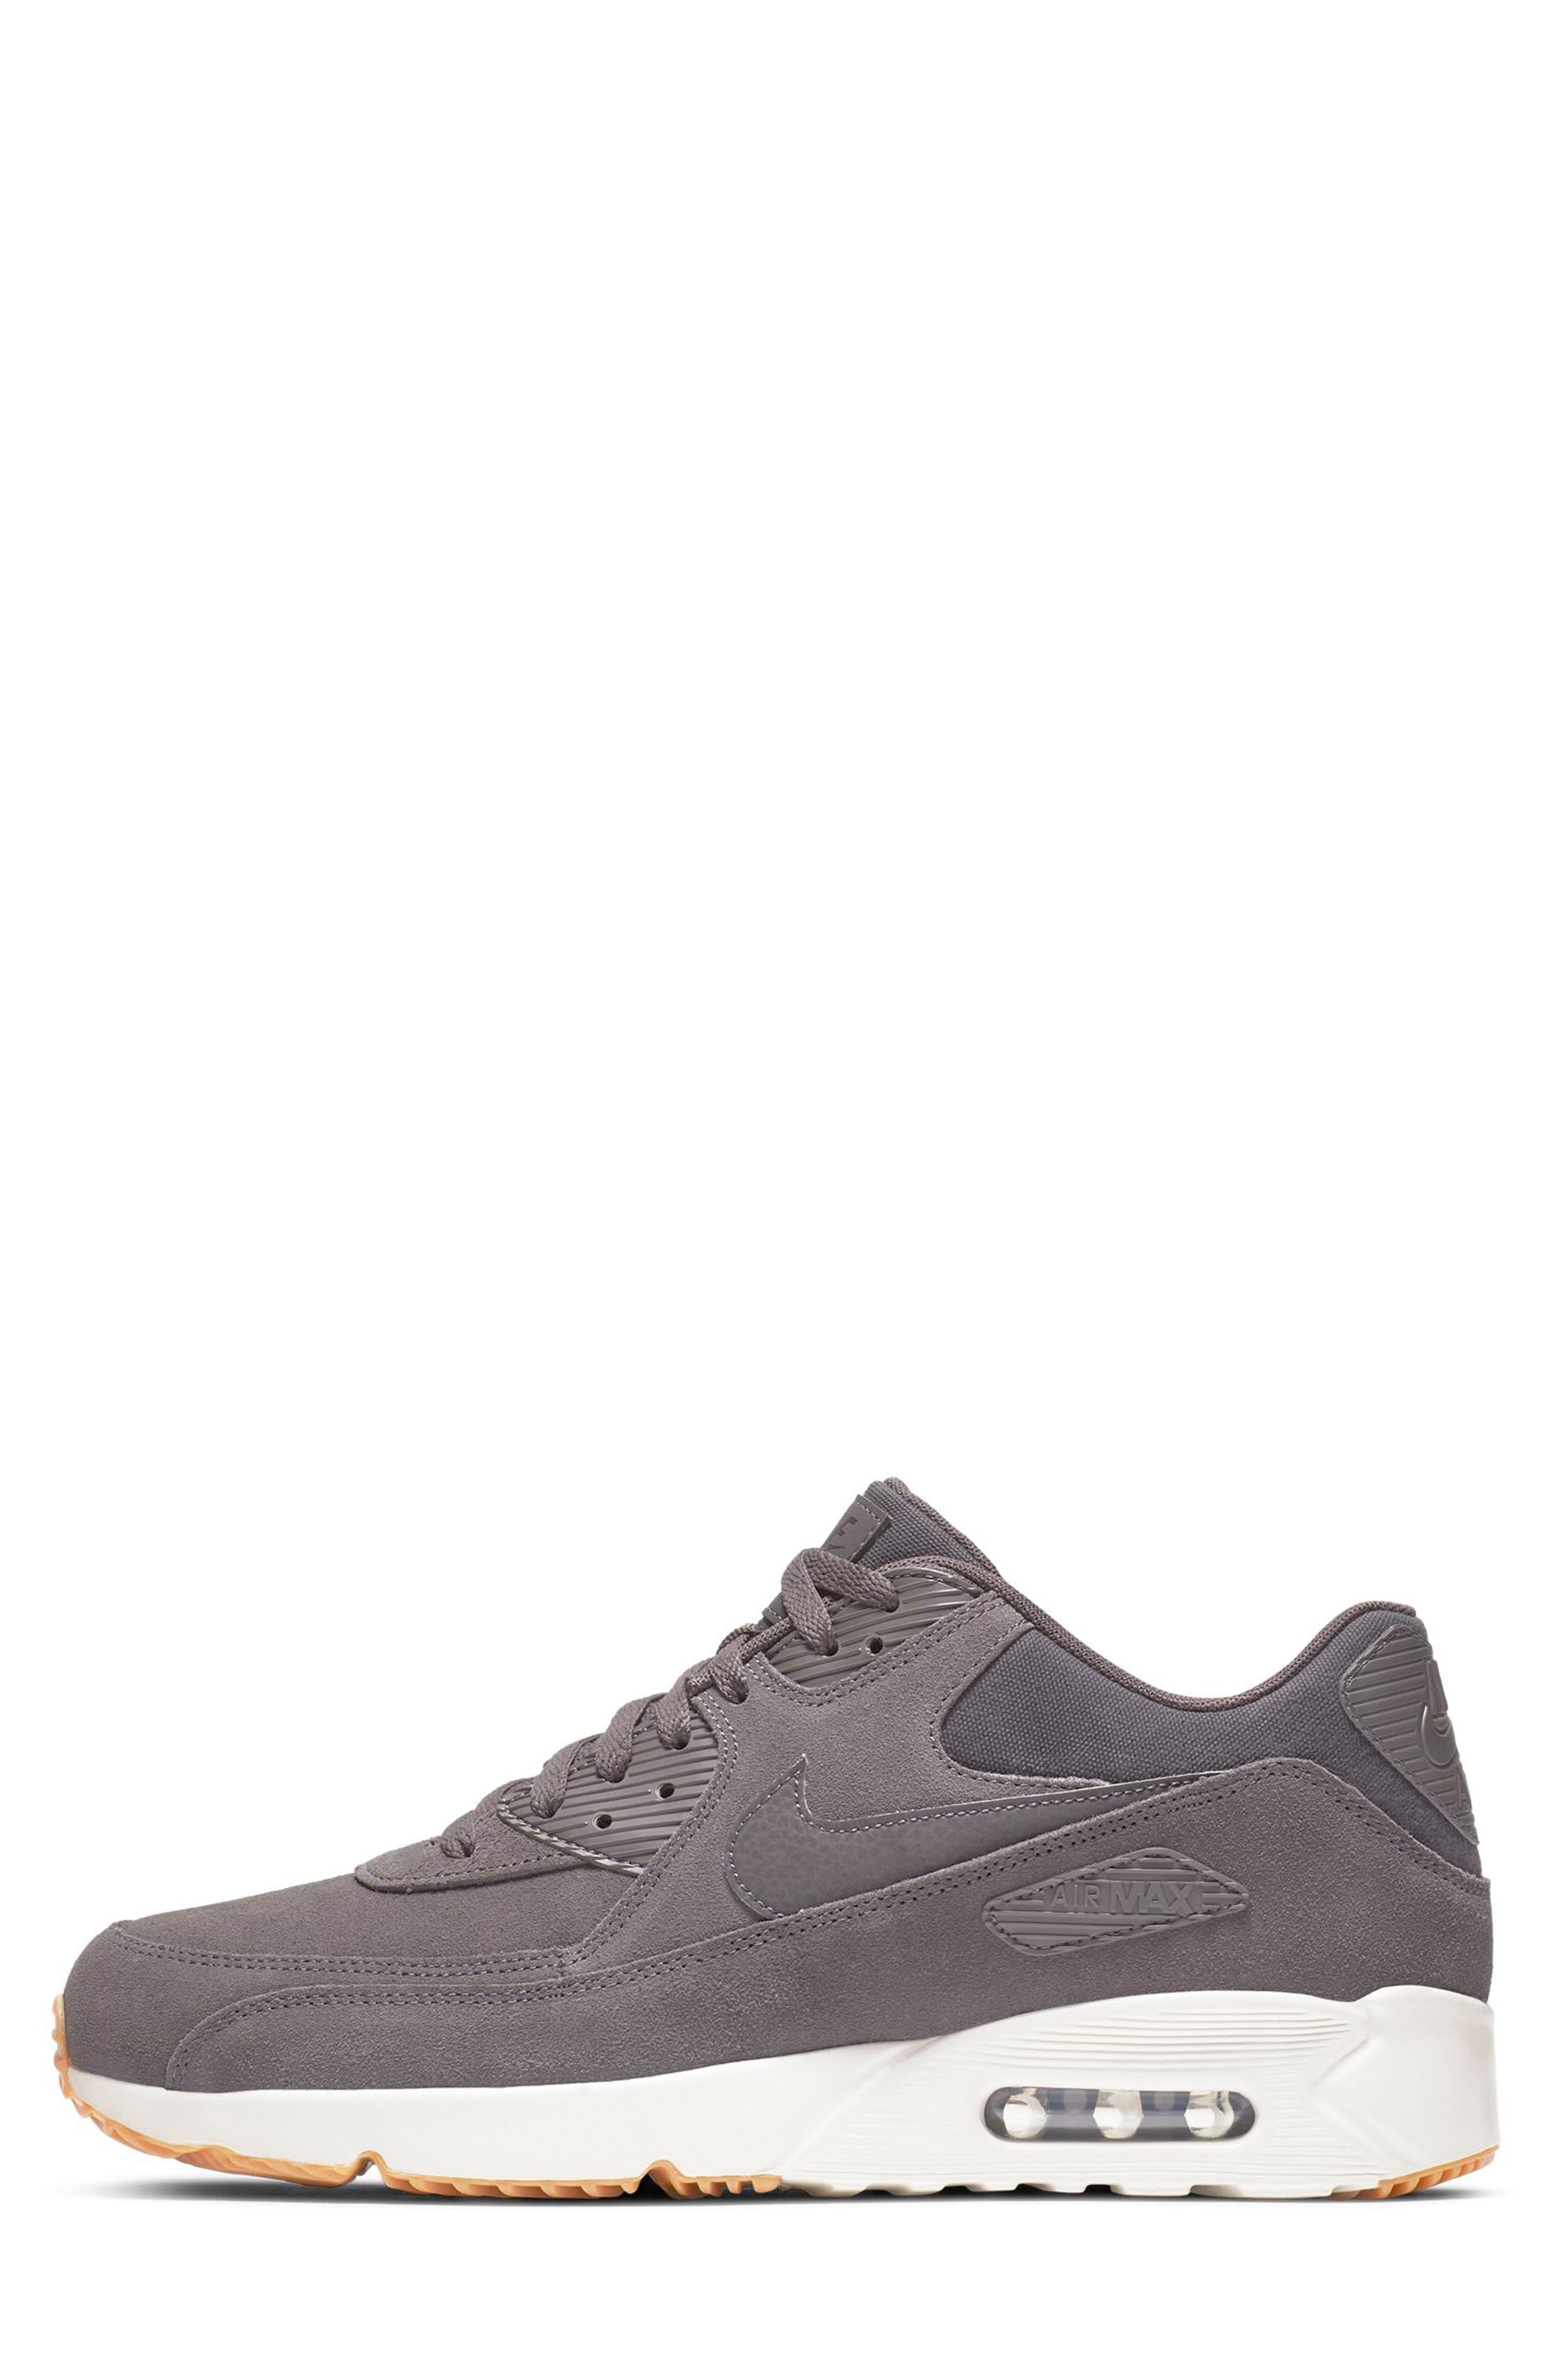 Air Max 90 Ultra 2.0 Sneaker,                             Alternate thumbnail 6, color,                             THUNDER GREY/ GREY/ LIGHT BONE